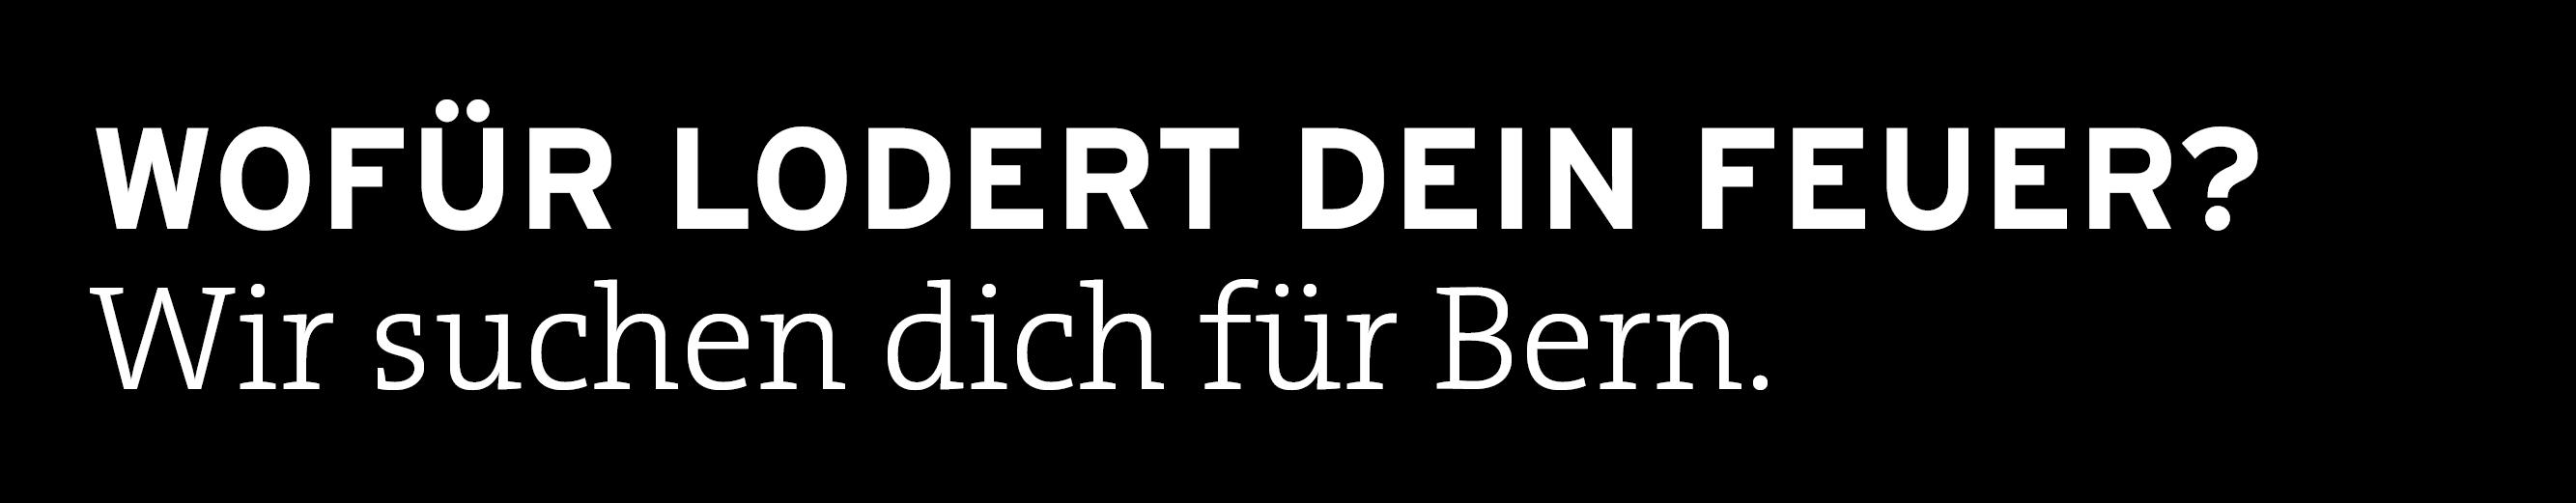 Transa Bern sucht…